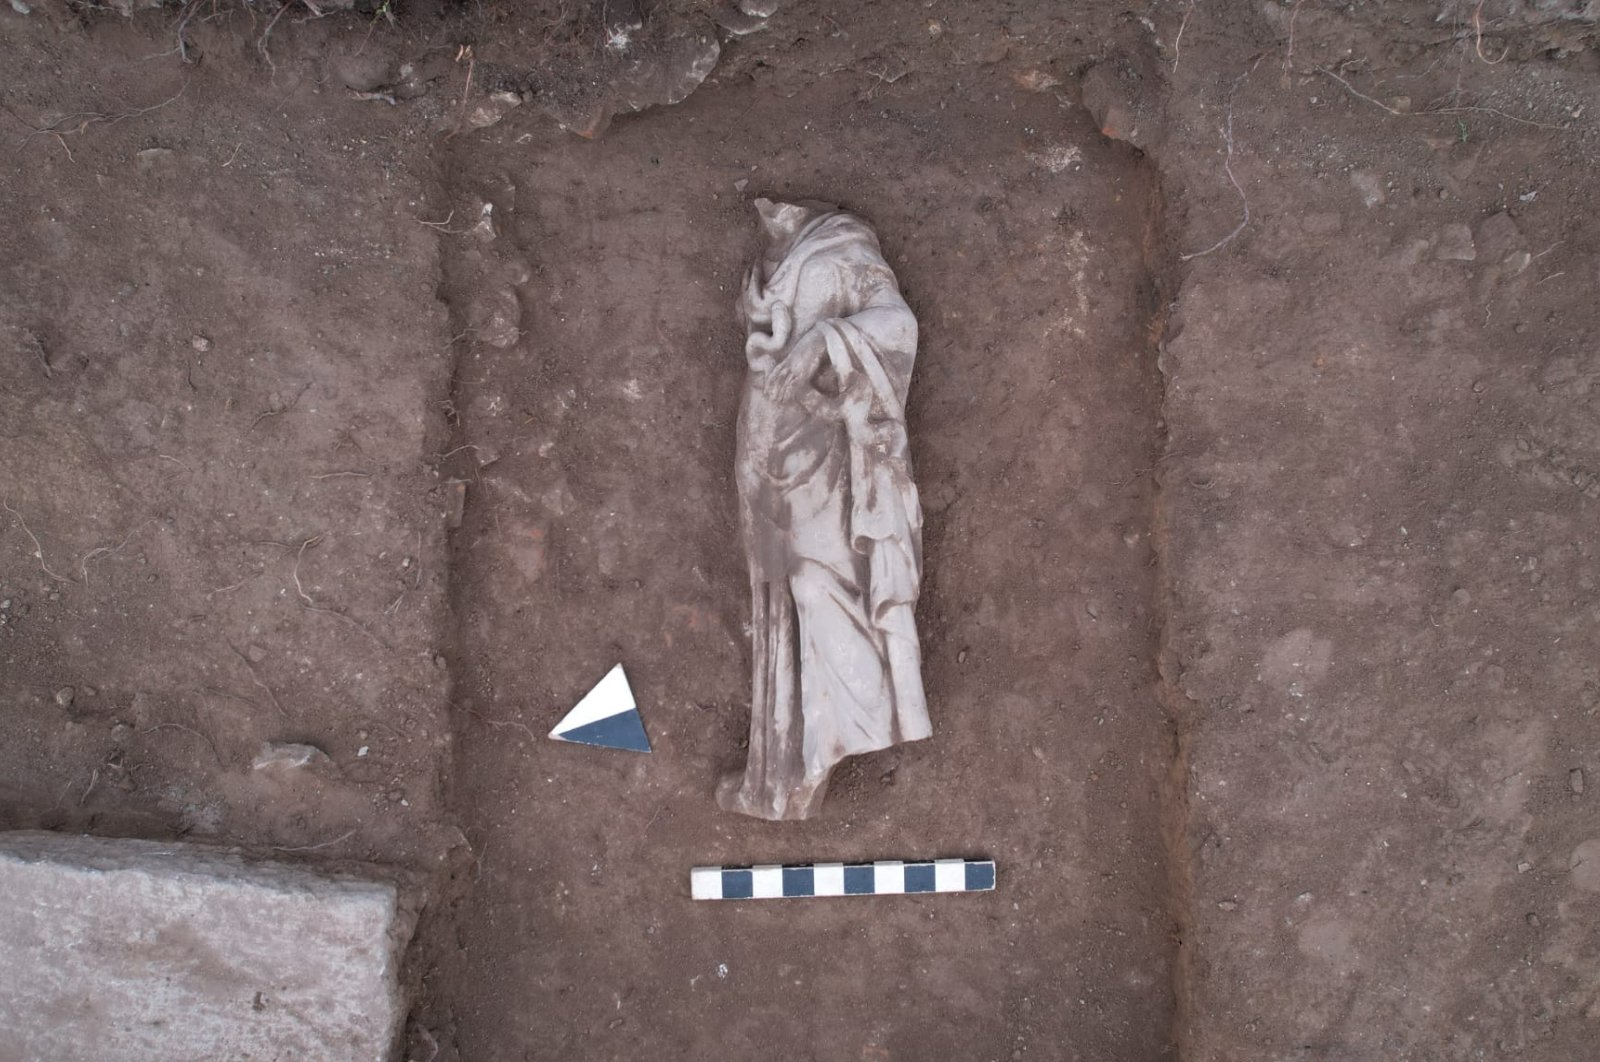 The statue of Hygieia in the ancient city of Aizanoi, Kütayha, western Turkey, Aug. 19, 2021. (AA Photo)